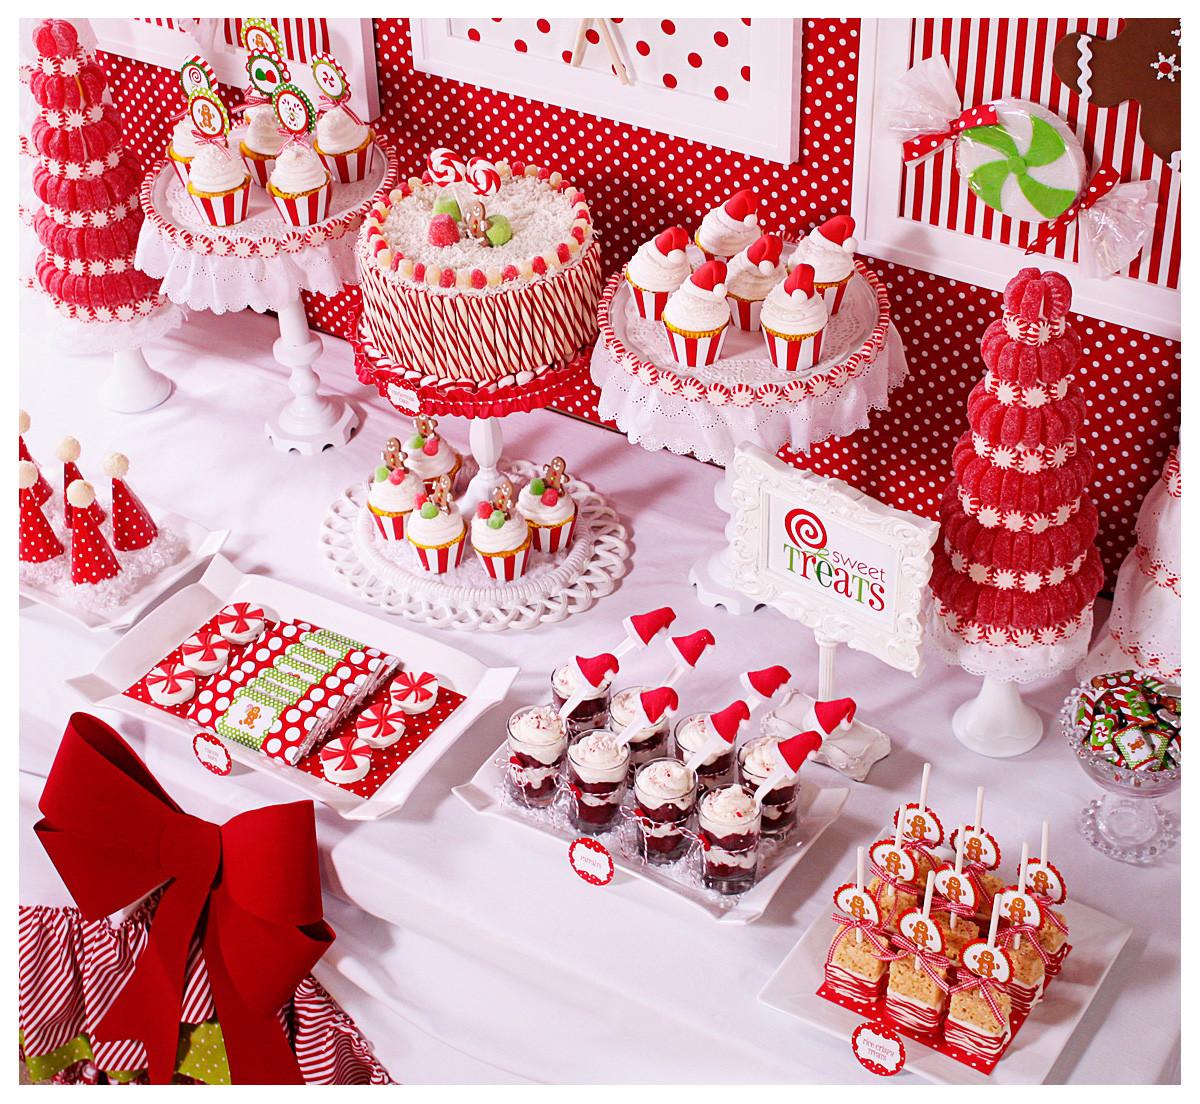 Christmas Dessert Ideas For Parties  Amanda s Parties To Go Candy Christmas Dessert Table